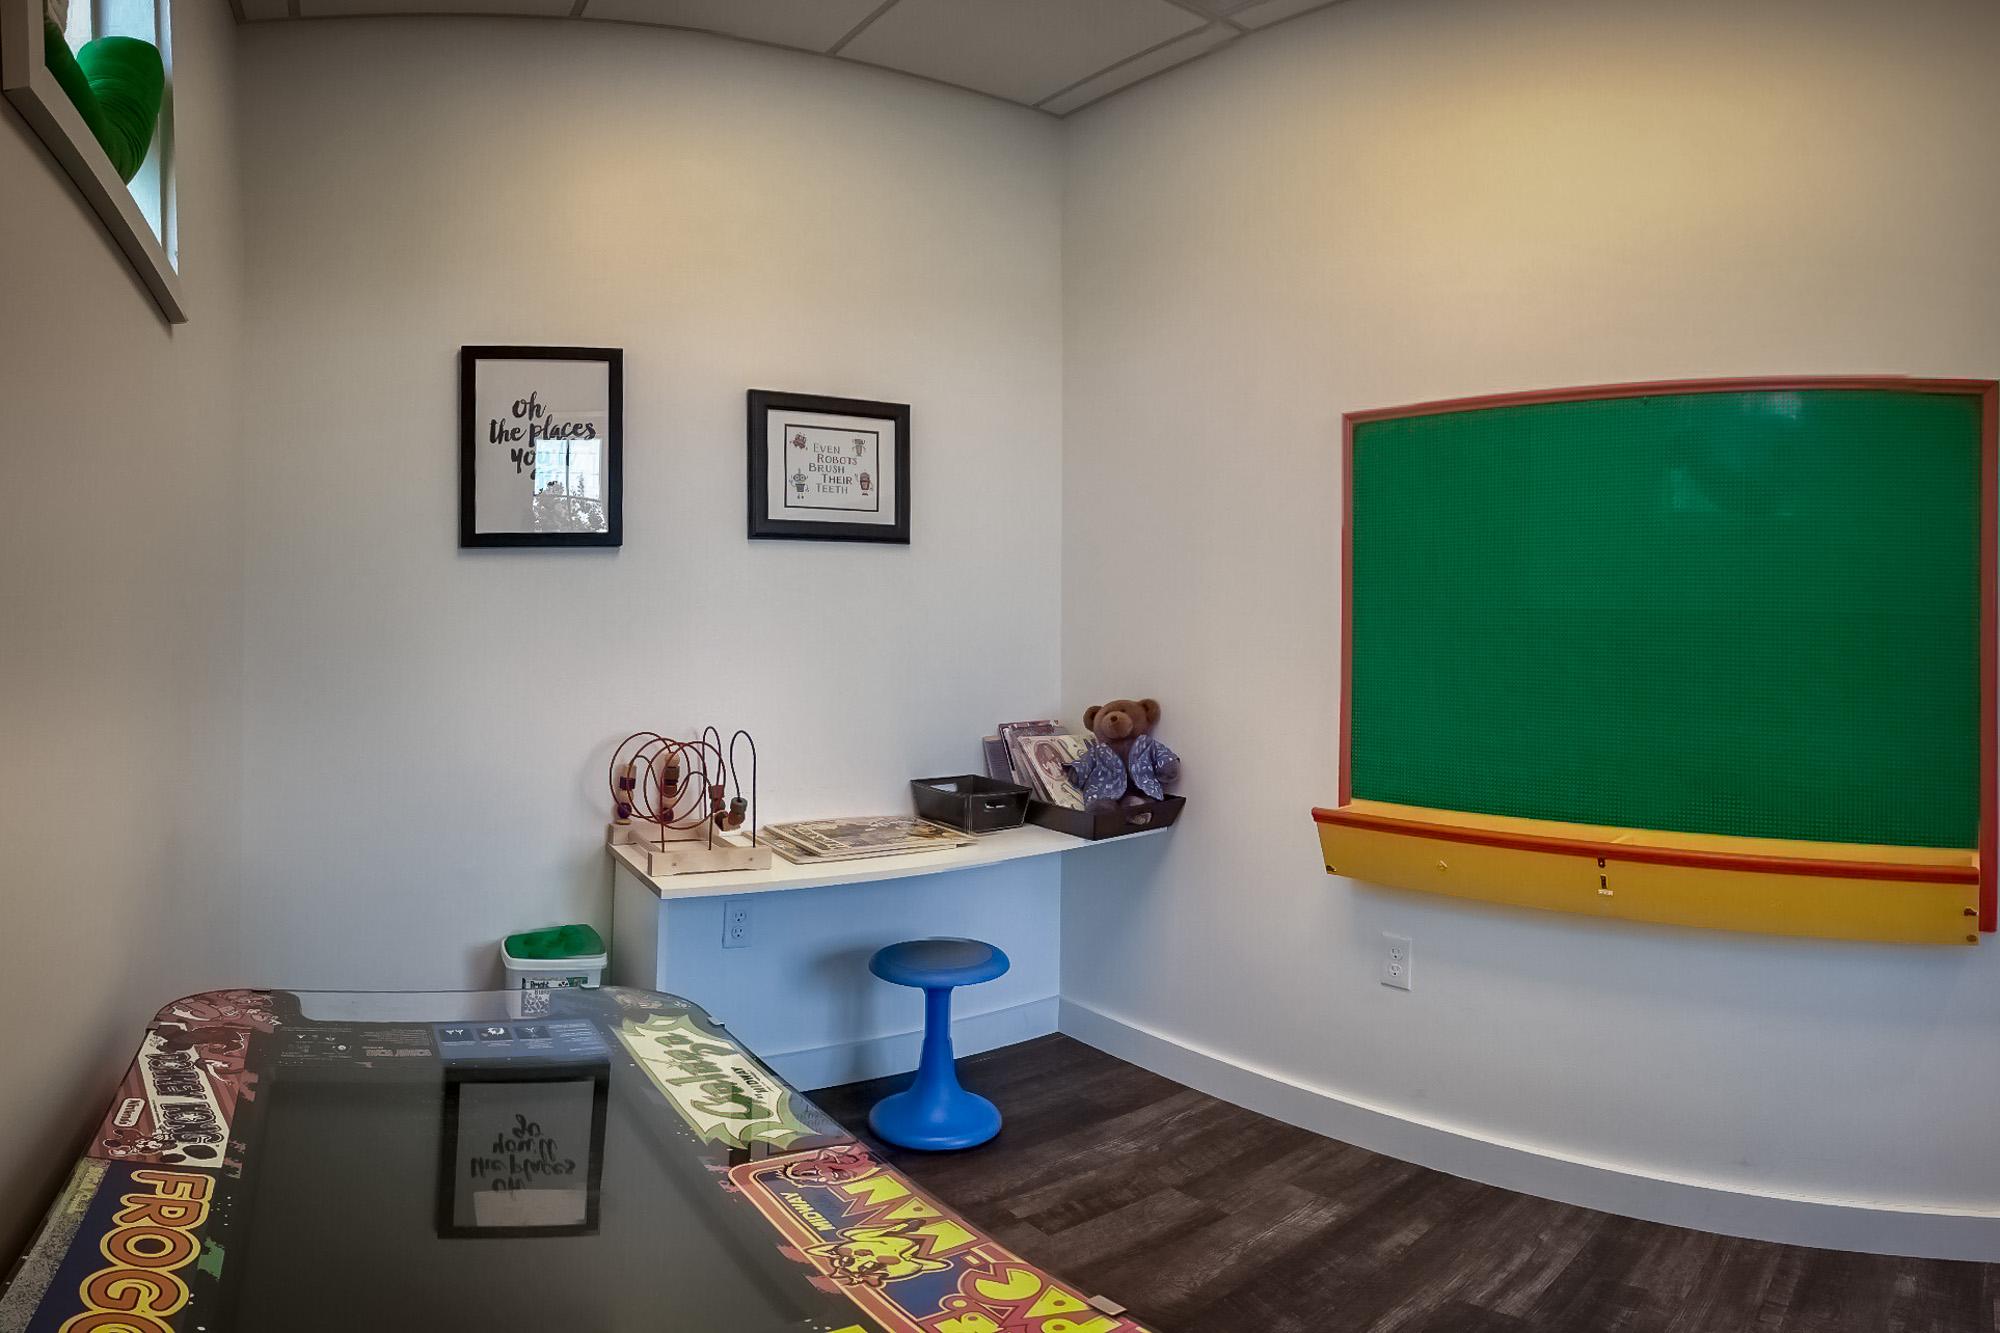 Kids Area | Wallace | Edmond | OK | Indoors | Color | 3x2 | Web Ready.jpg